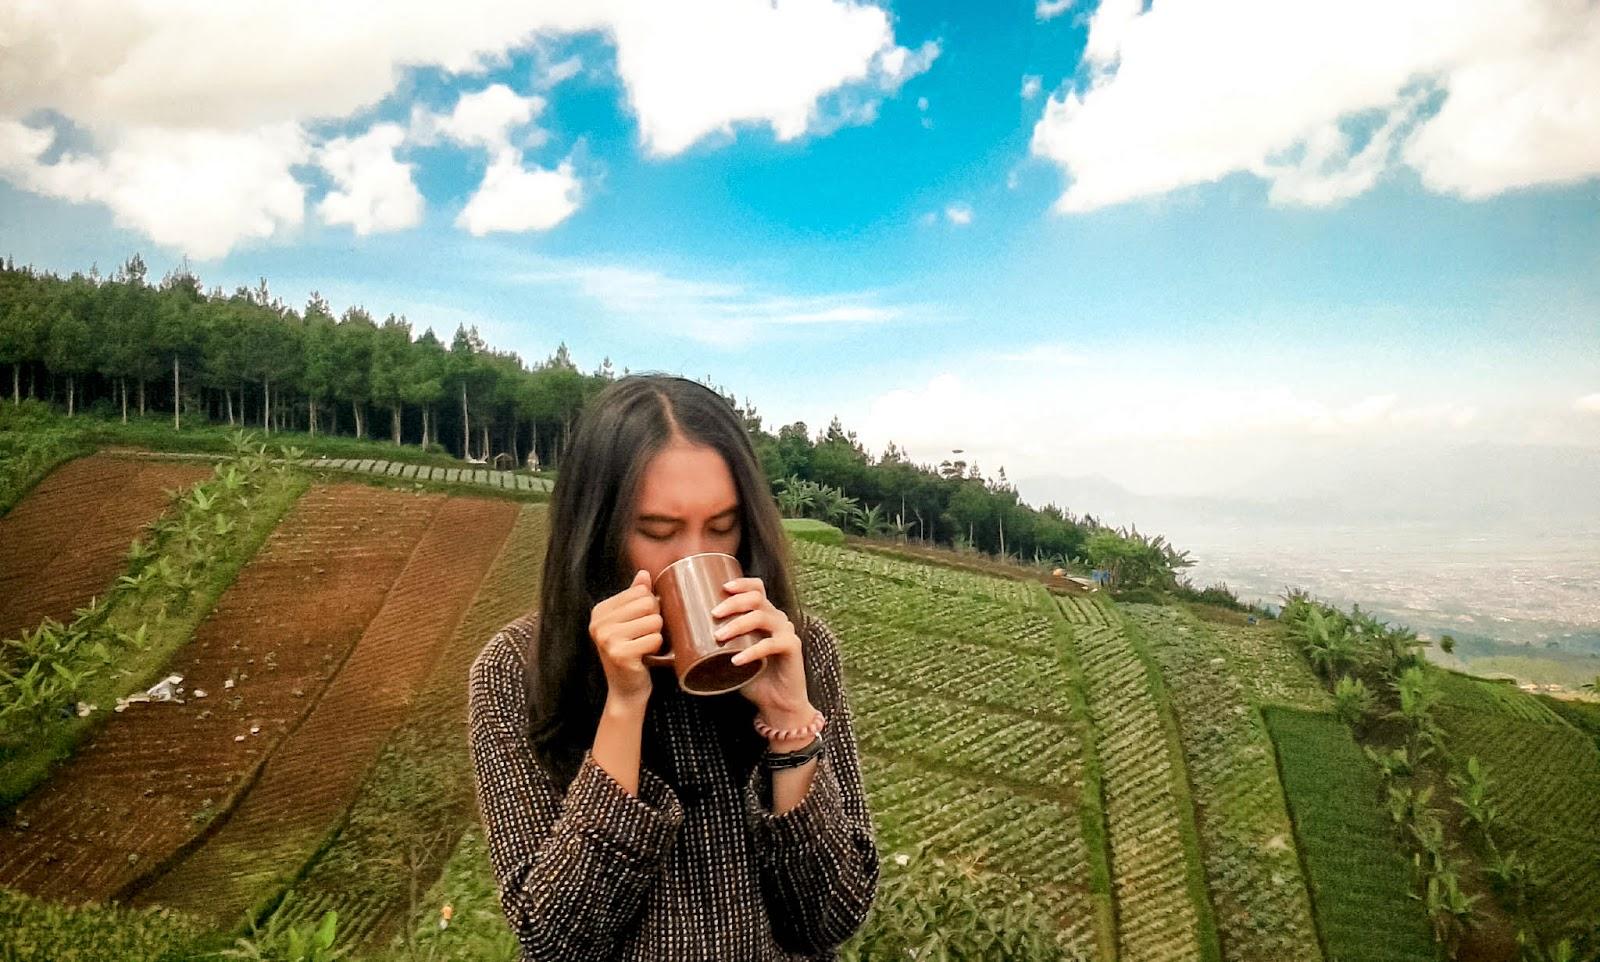 Deasiamela Bukit Moko Puncak Bintang Ceritanya Candid Sama Emput Haha